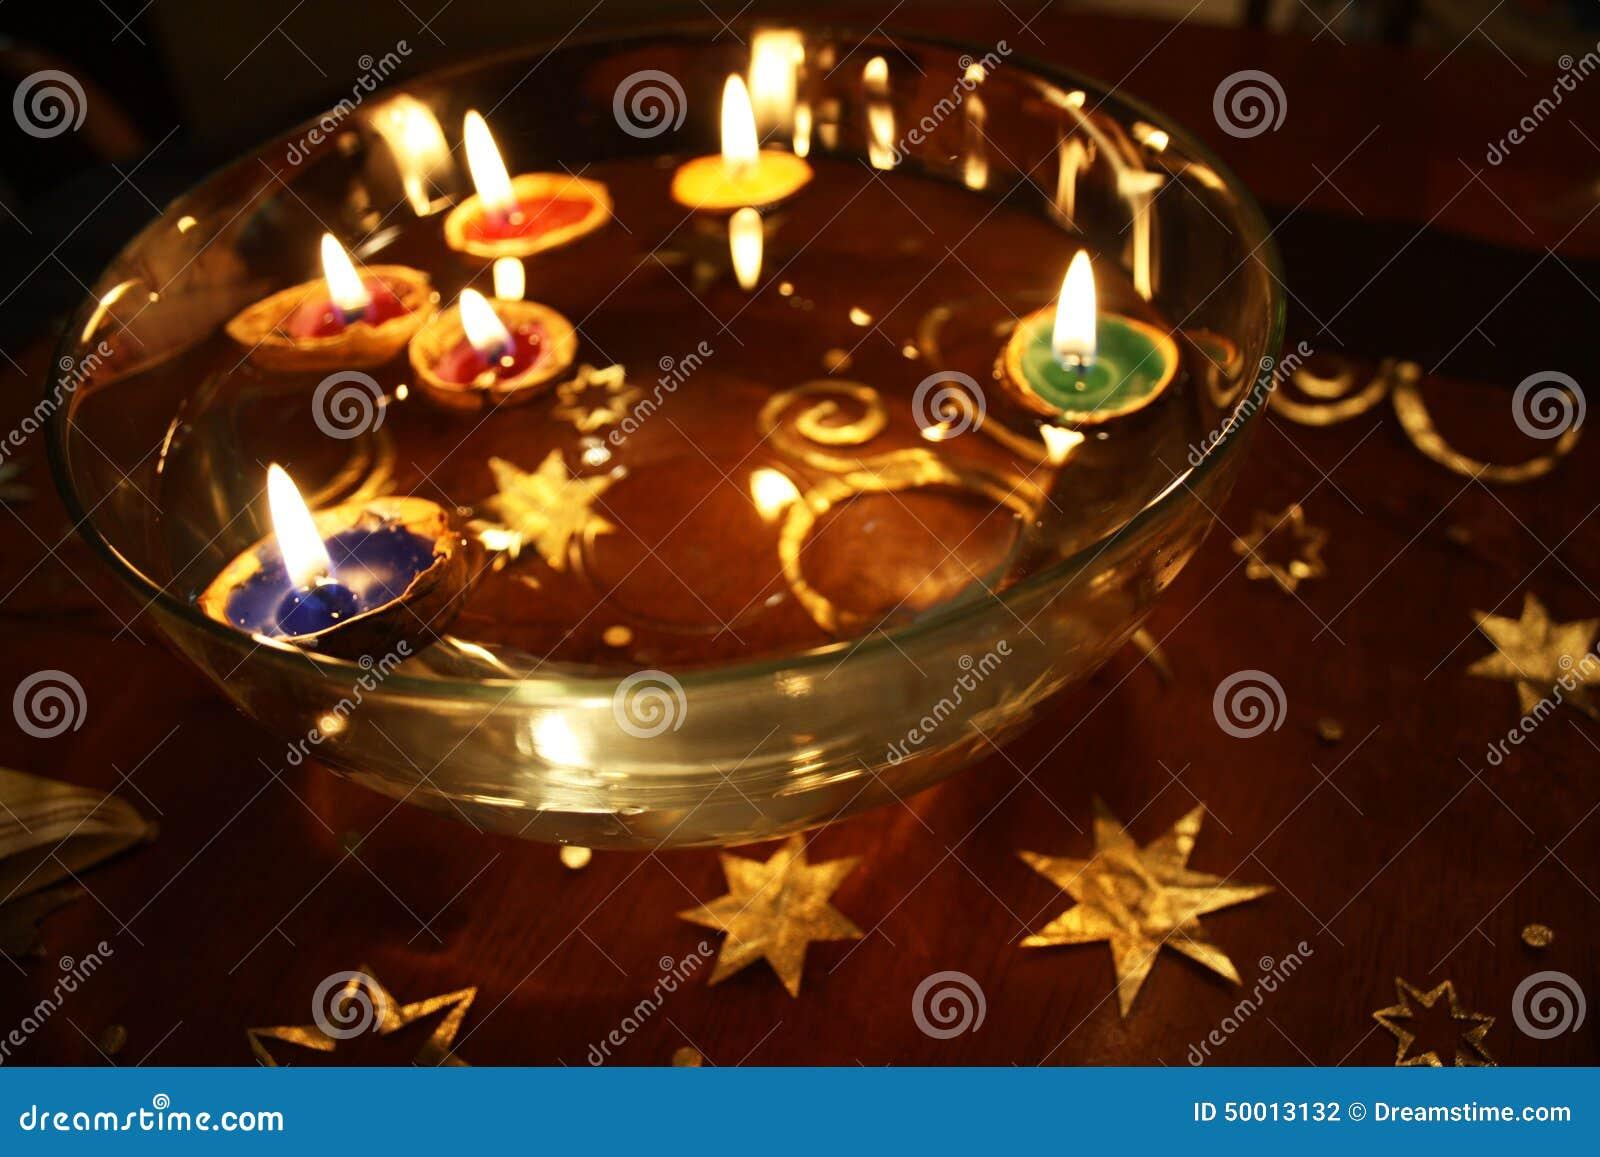 Christmas Floating Candles.Christmas Candles Stock Photo Image Of Stars Christmas